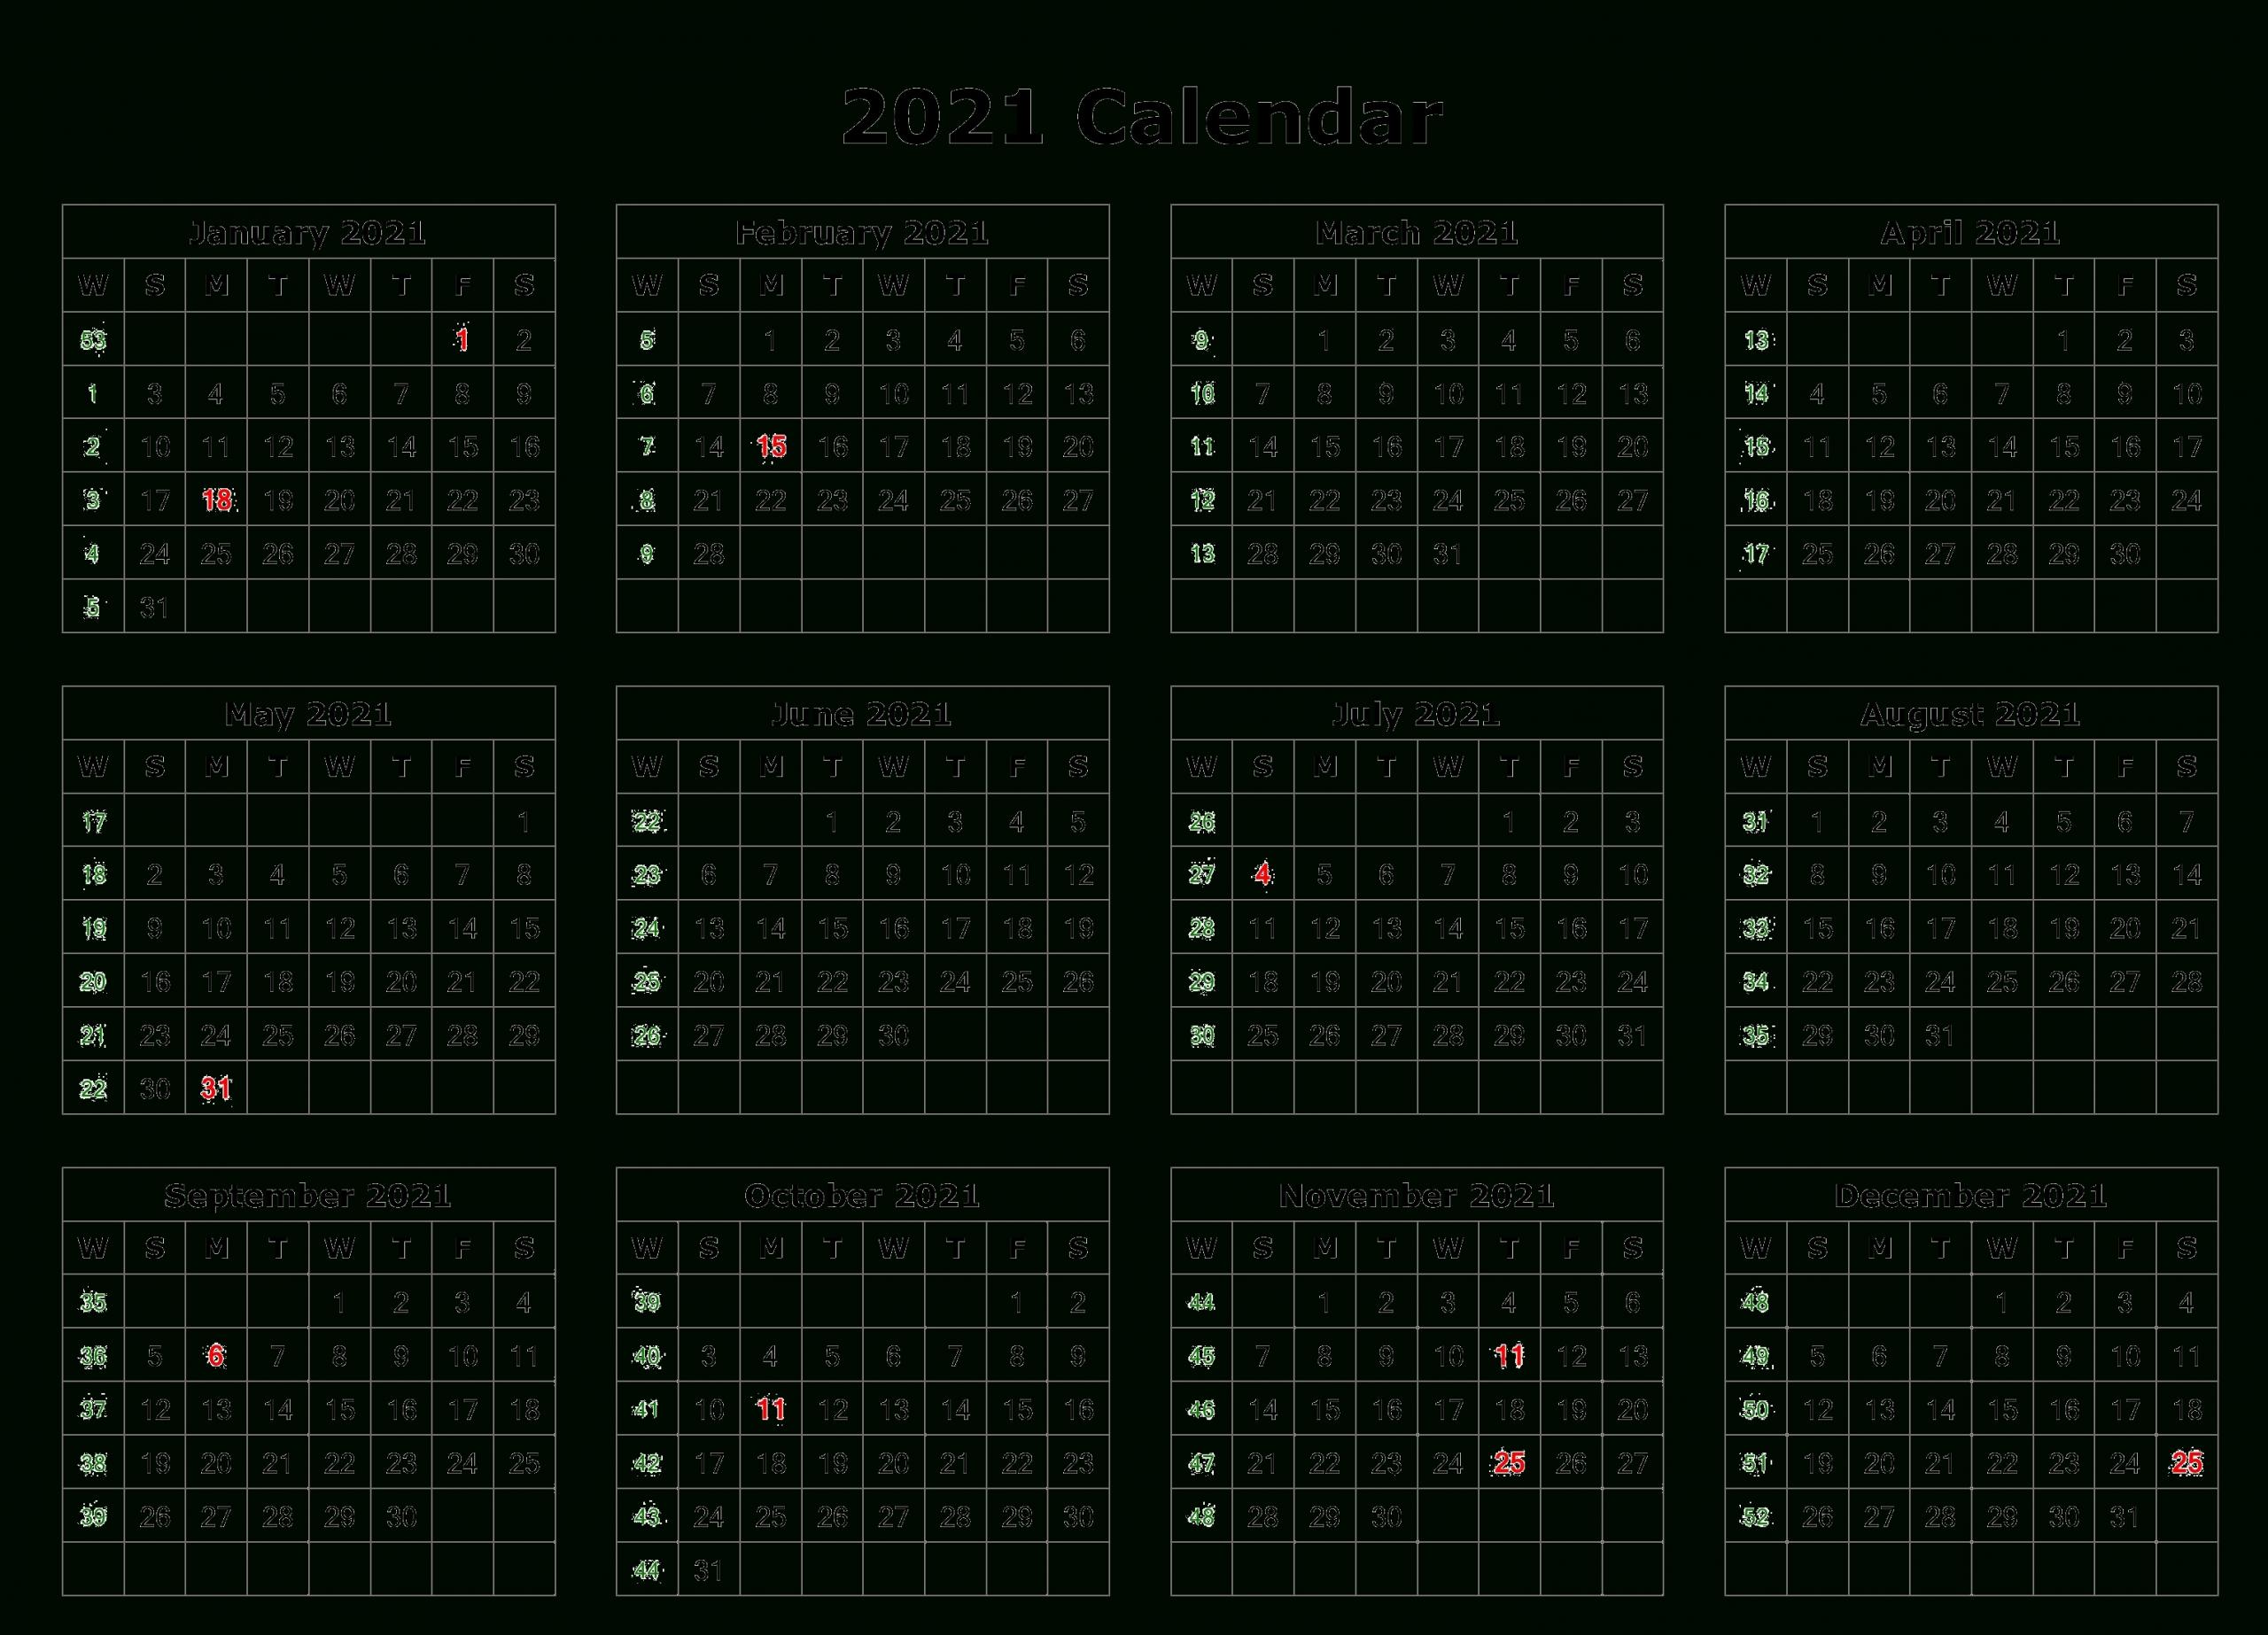 2021 Calendar Png Transparent Images | Png All  Calendar 2021 With Gregorian Dates